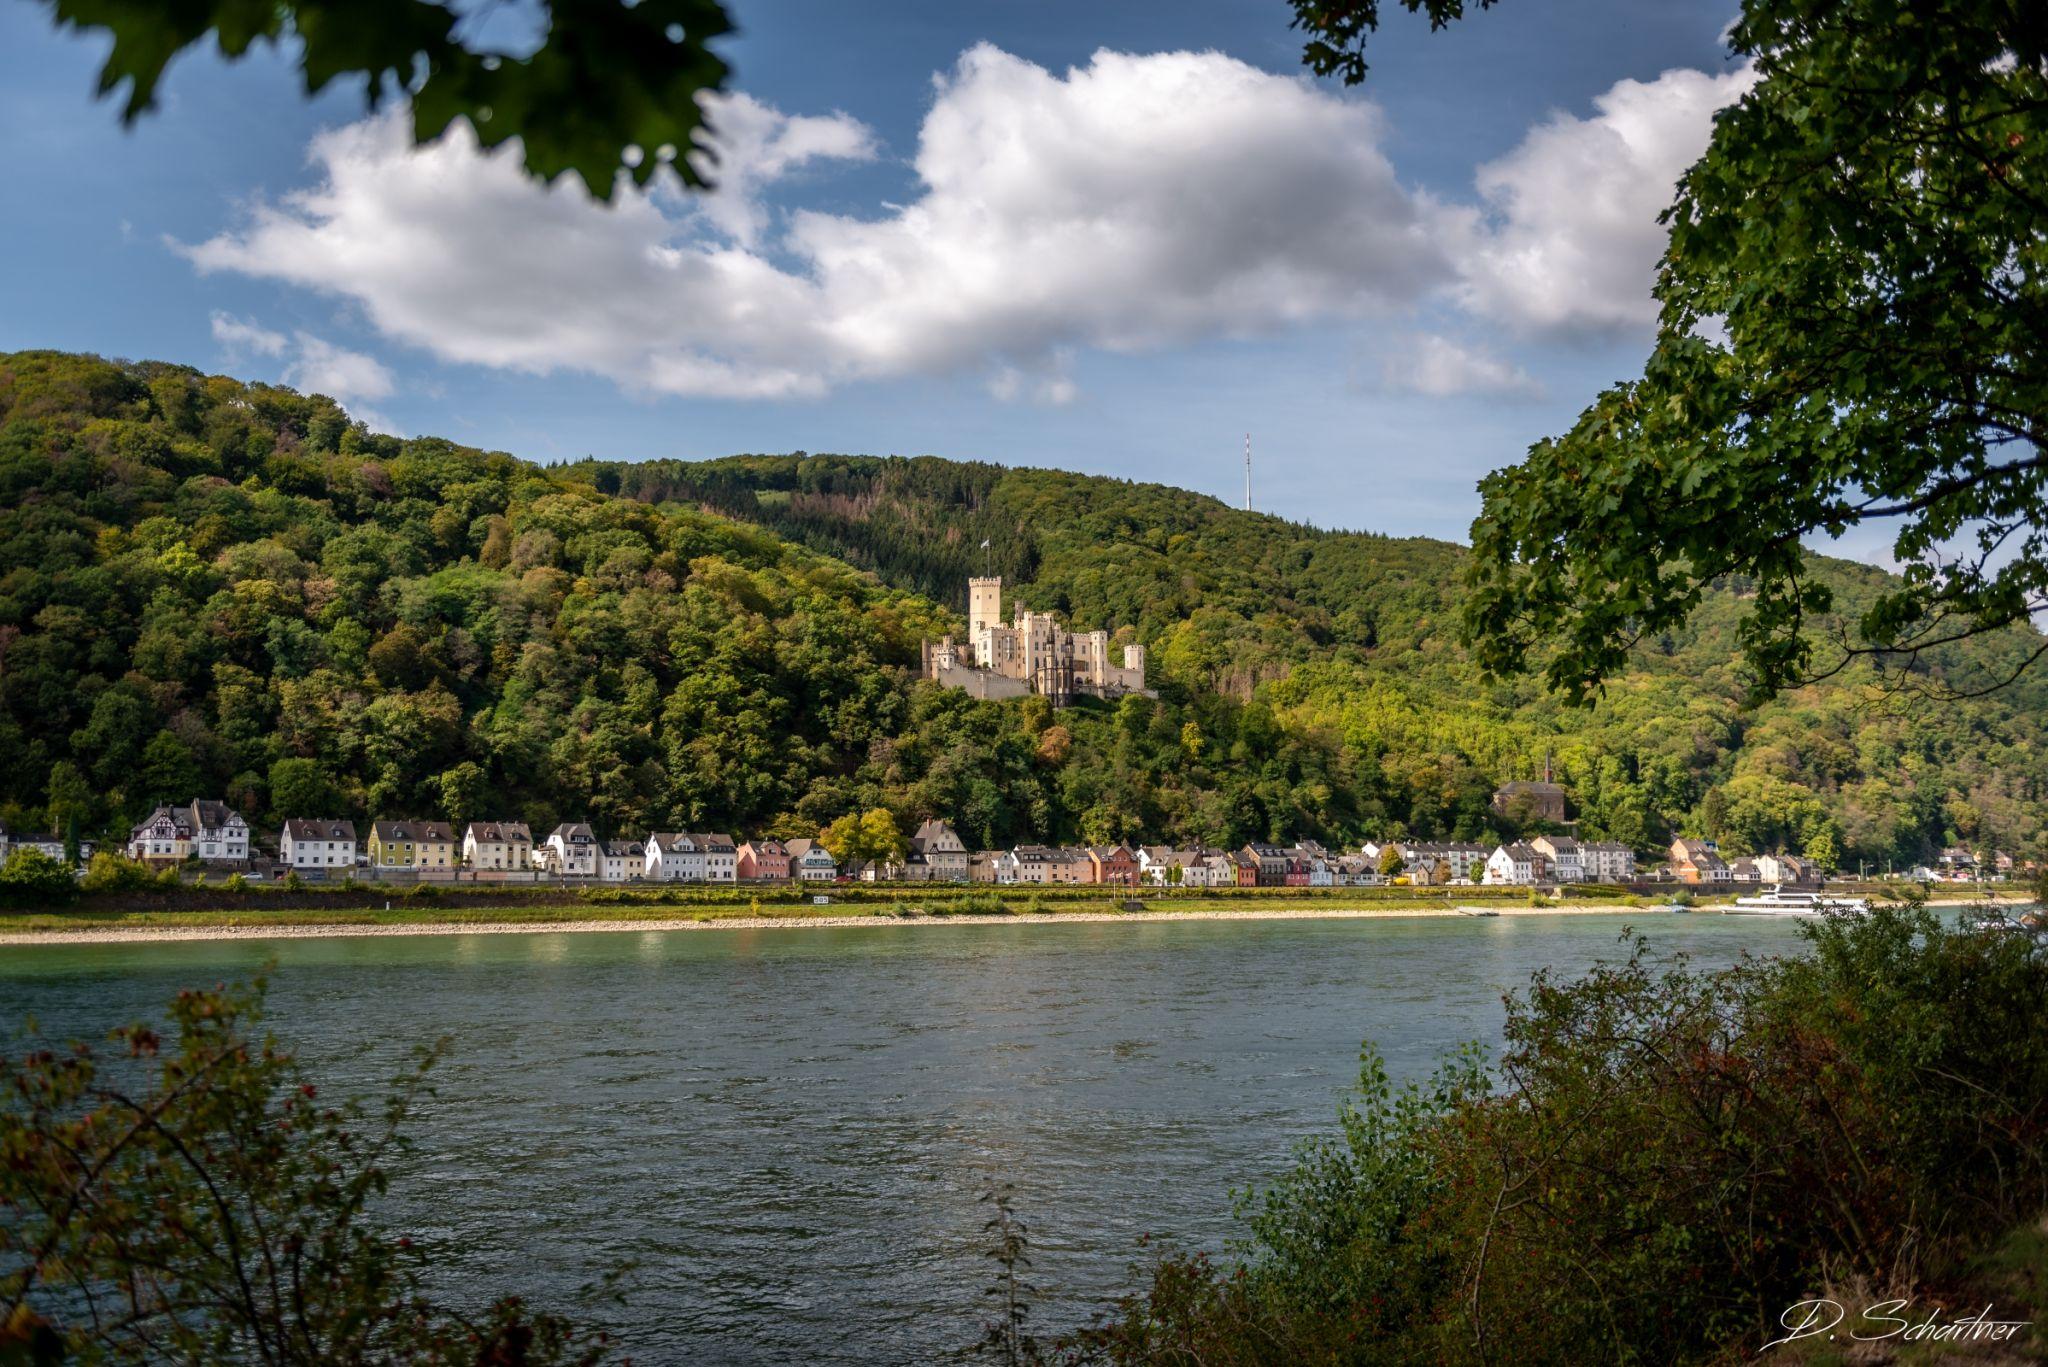 Schloss Stolzenfels, Germany